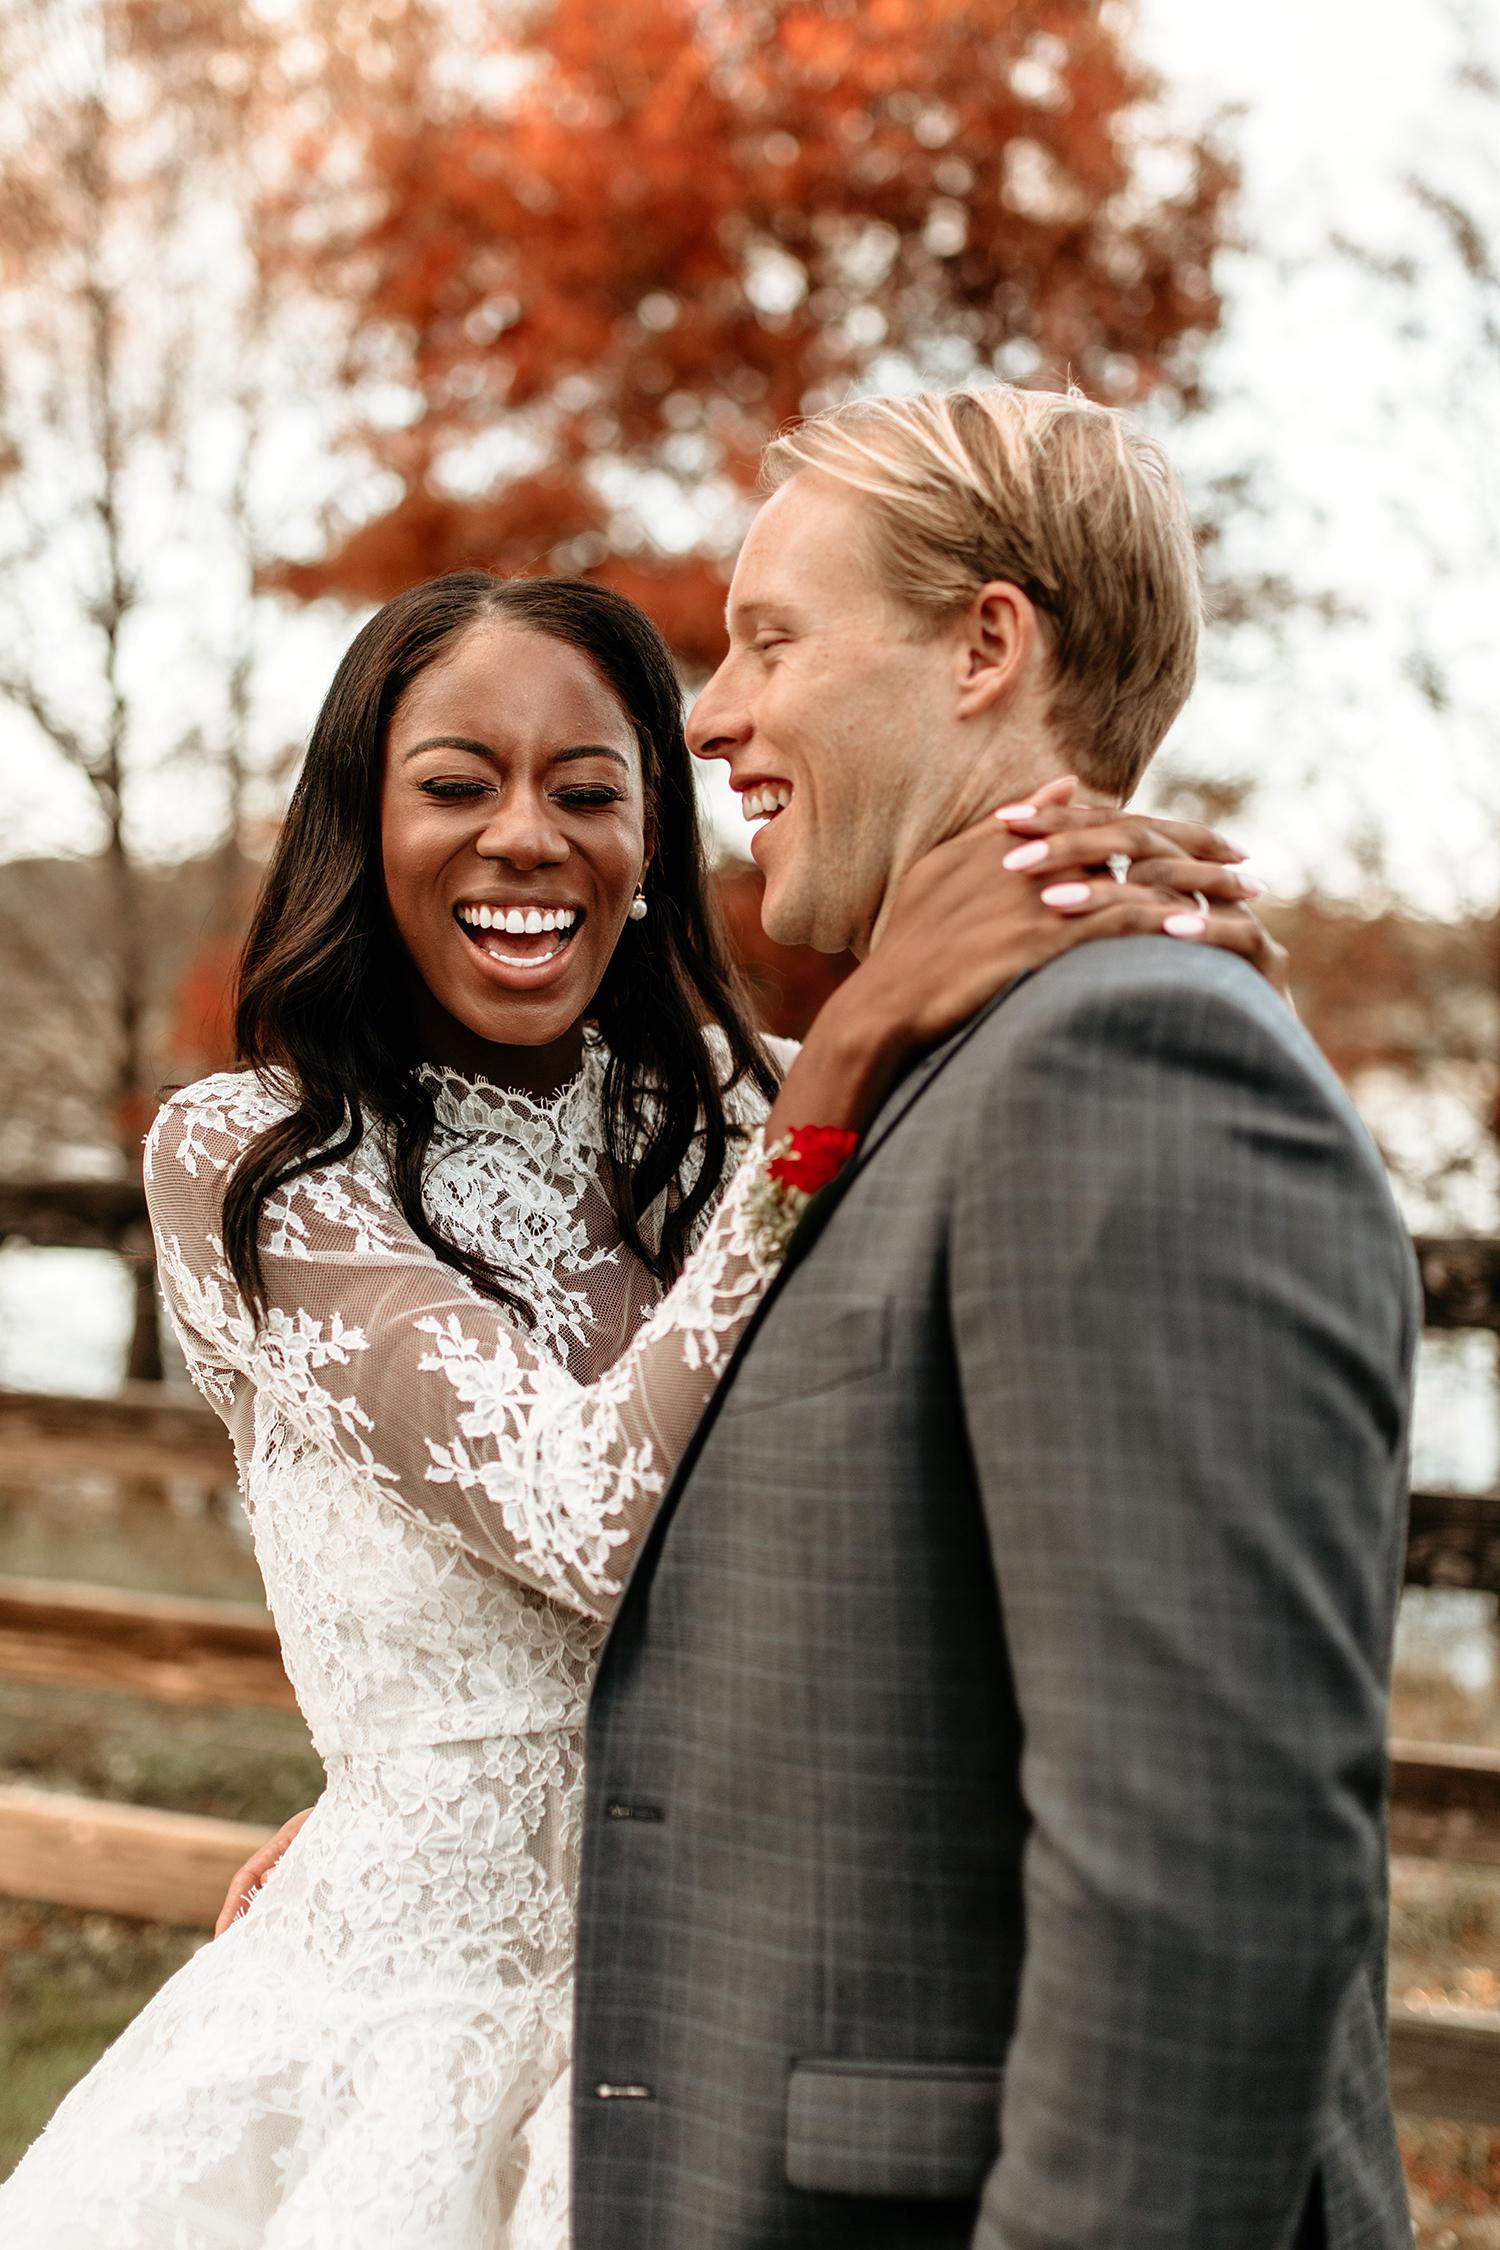 aerielle dyan wedding couple laughing